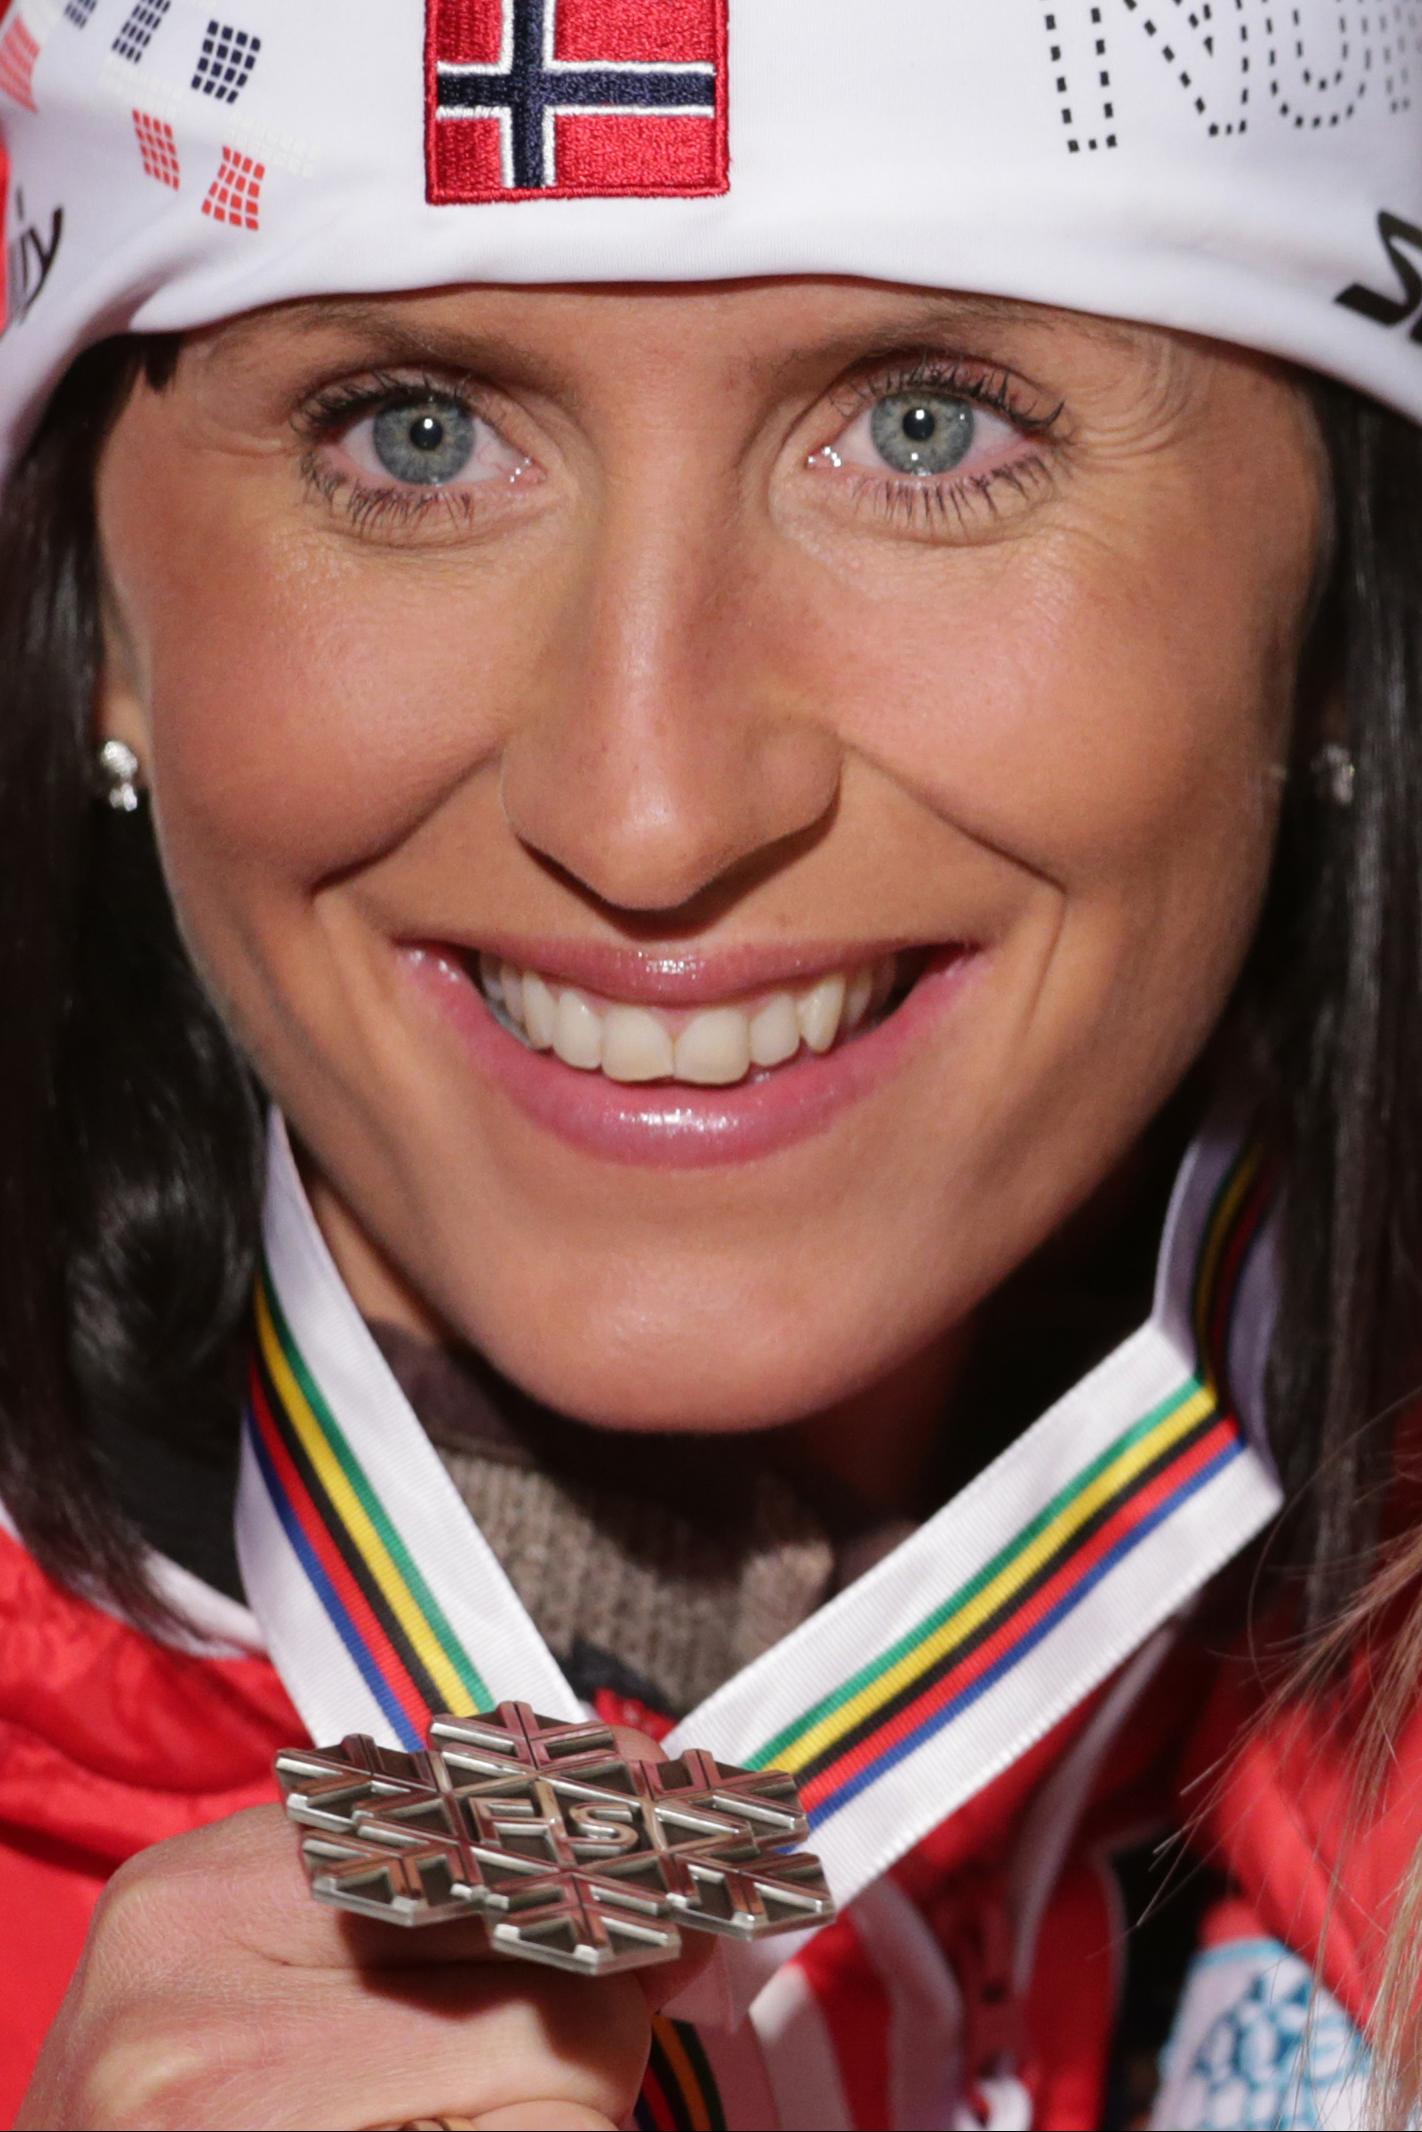 Marit bjoergen 2014 winter olympics olympic athletes sochi